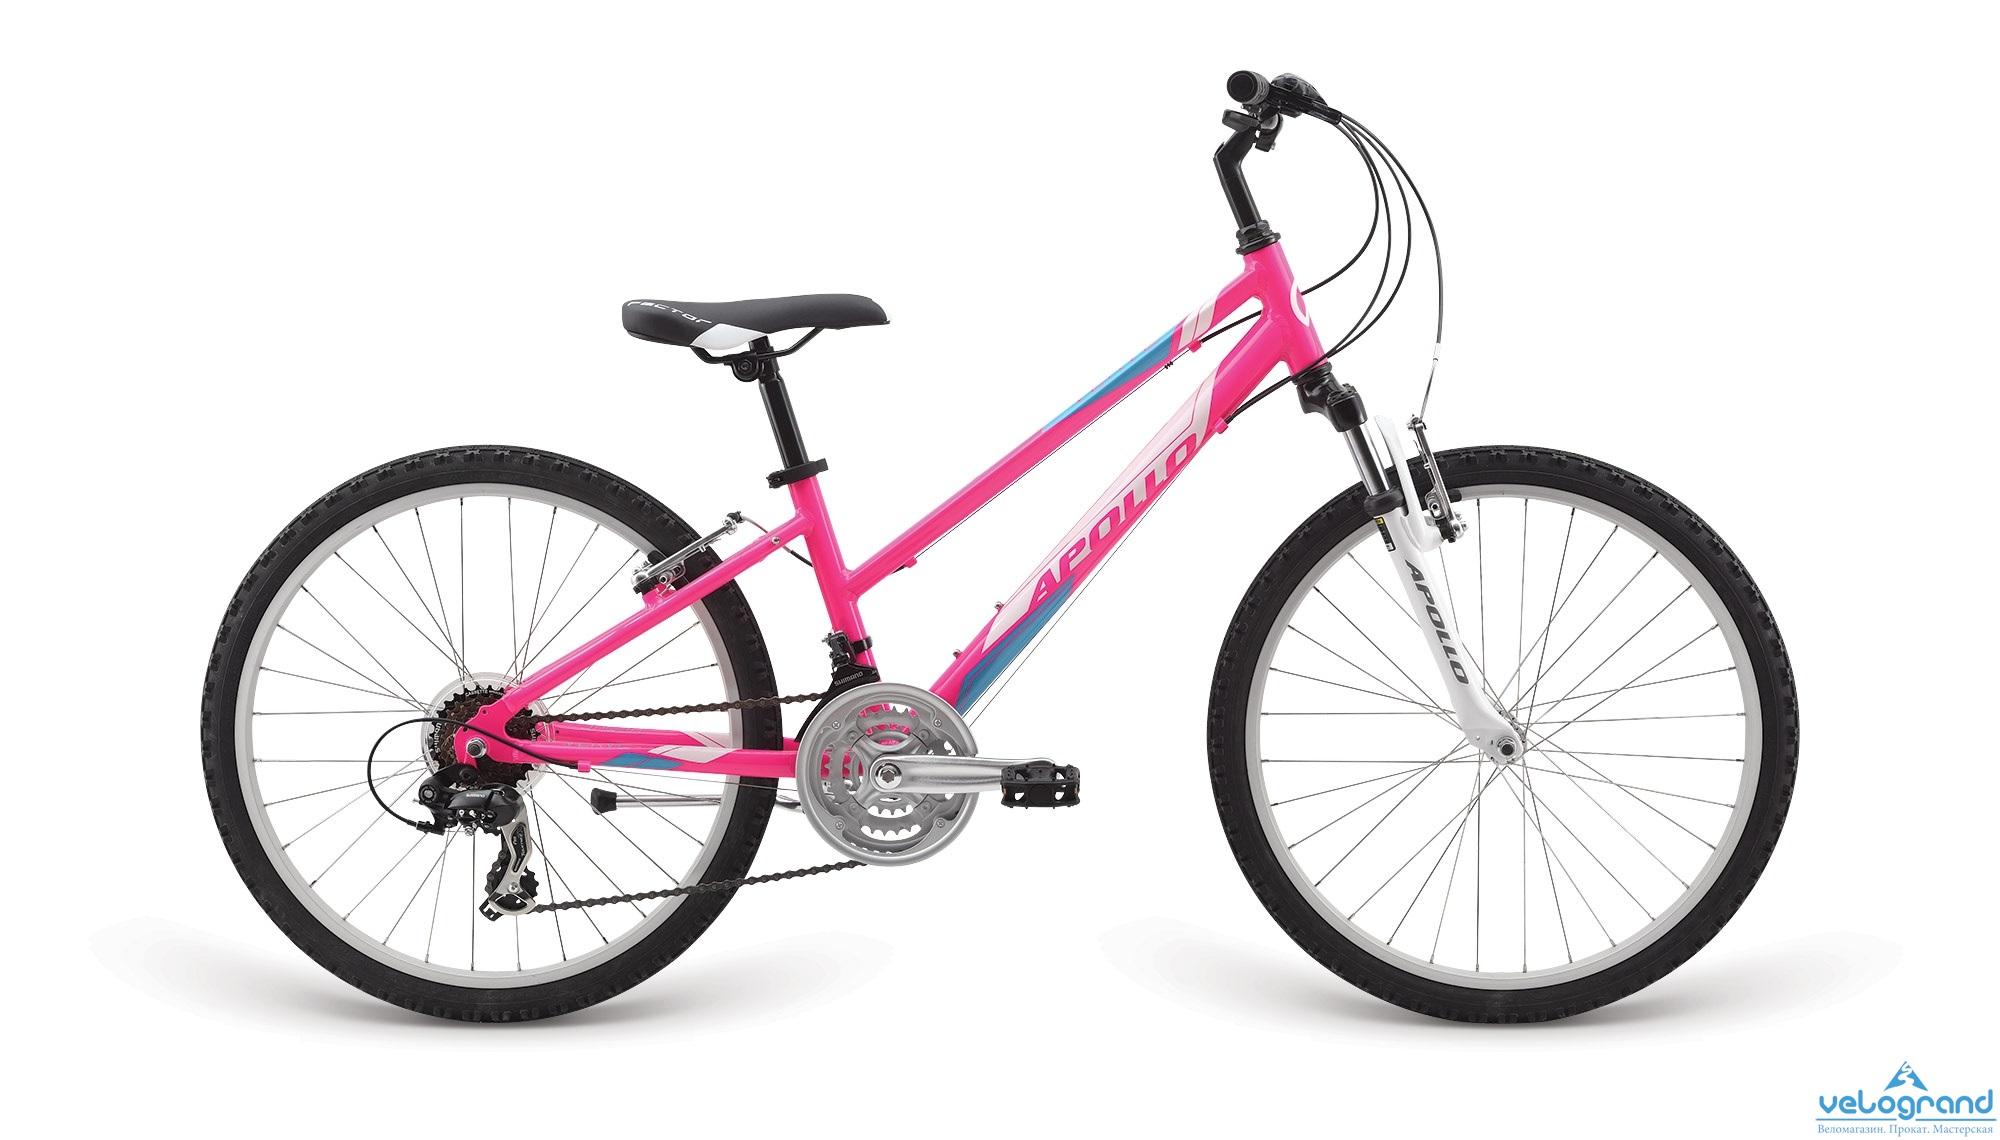 Подростковый велосипед APOLLO VERVE 24 (2015) от Velogrand